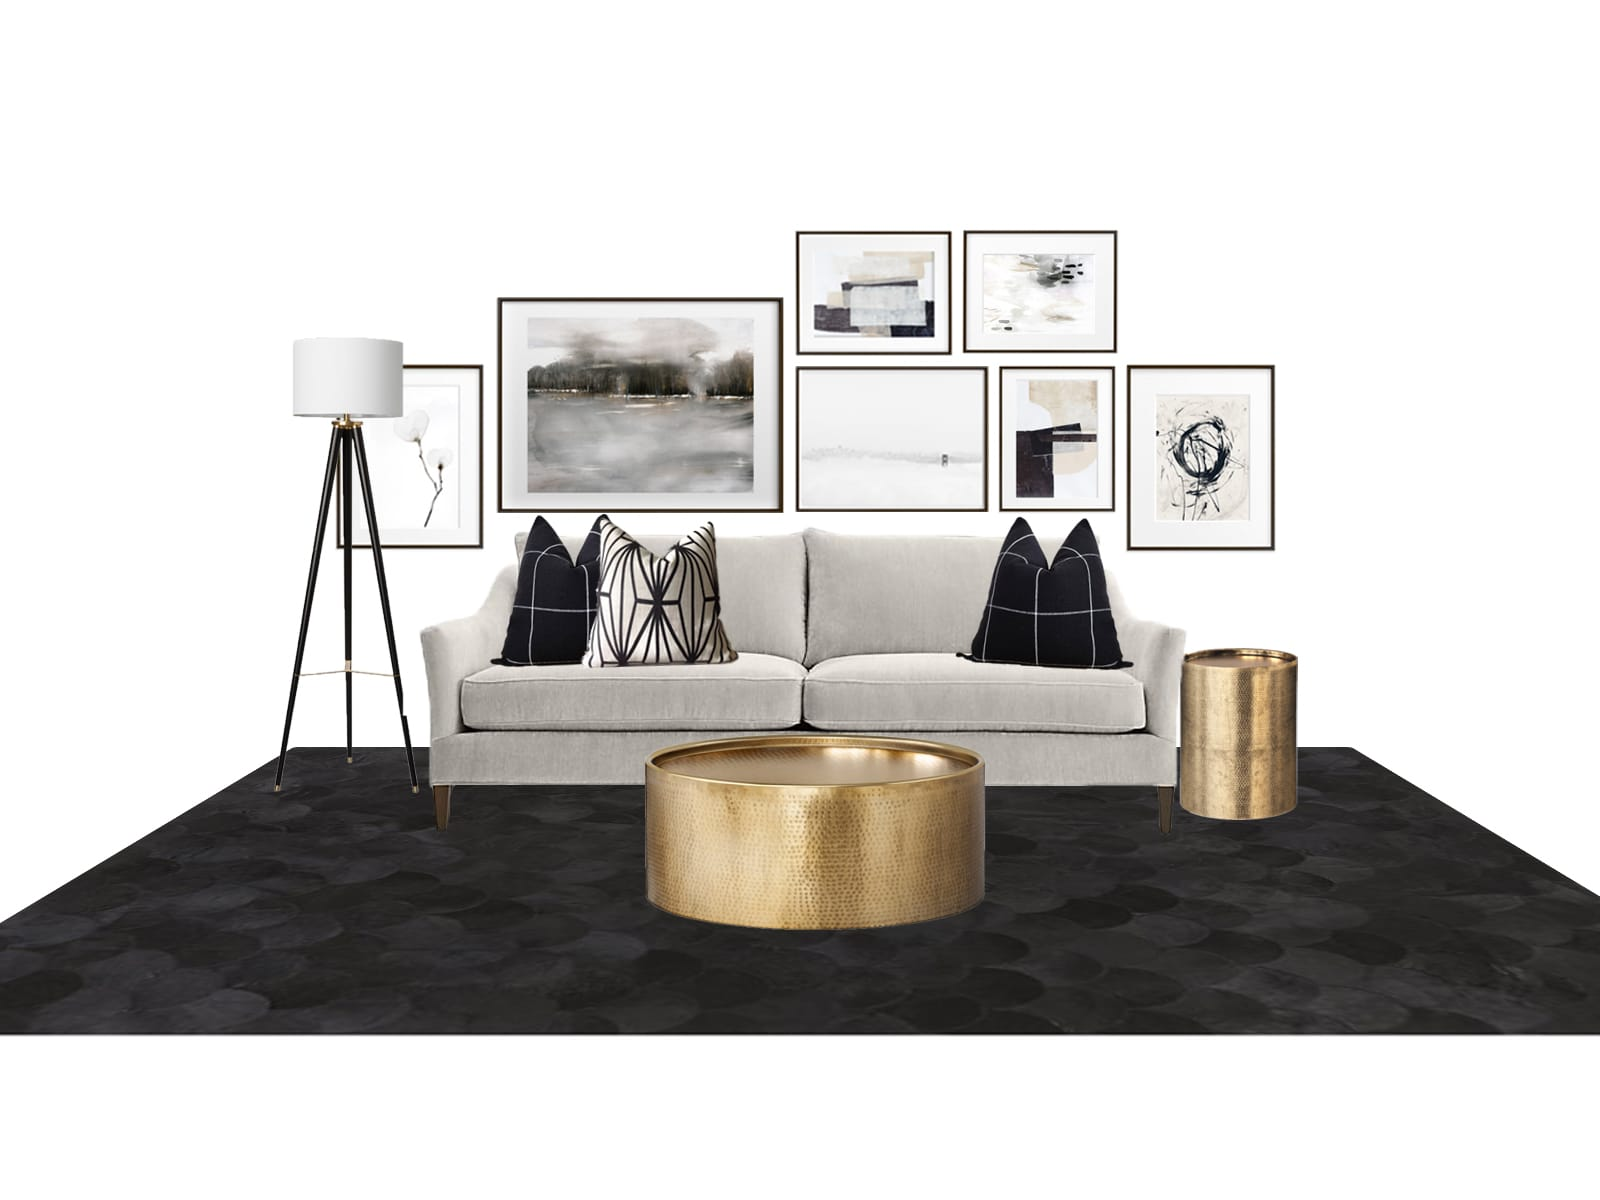 Interior Design Dramatic and Modern Sofa